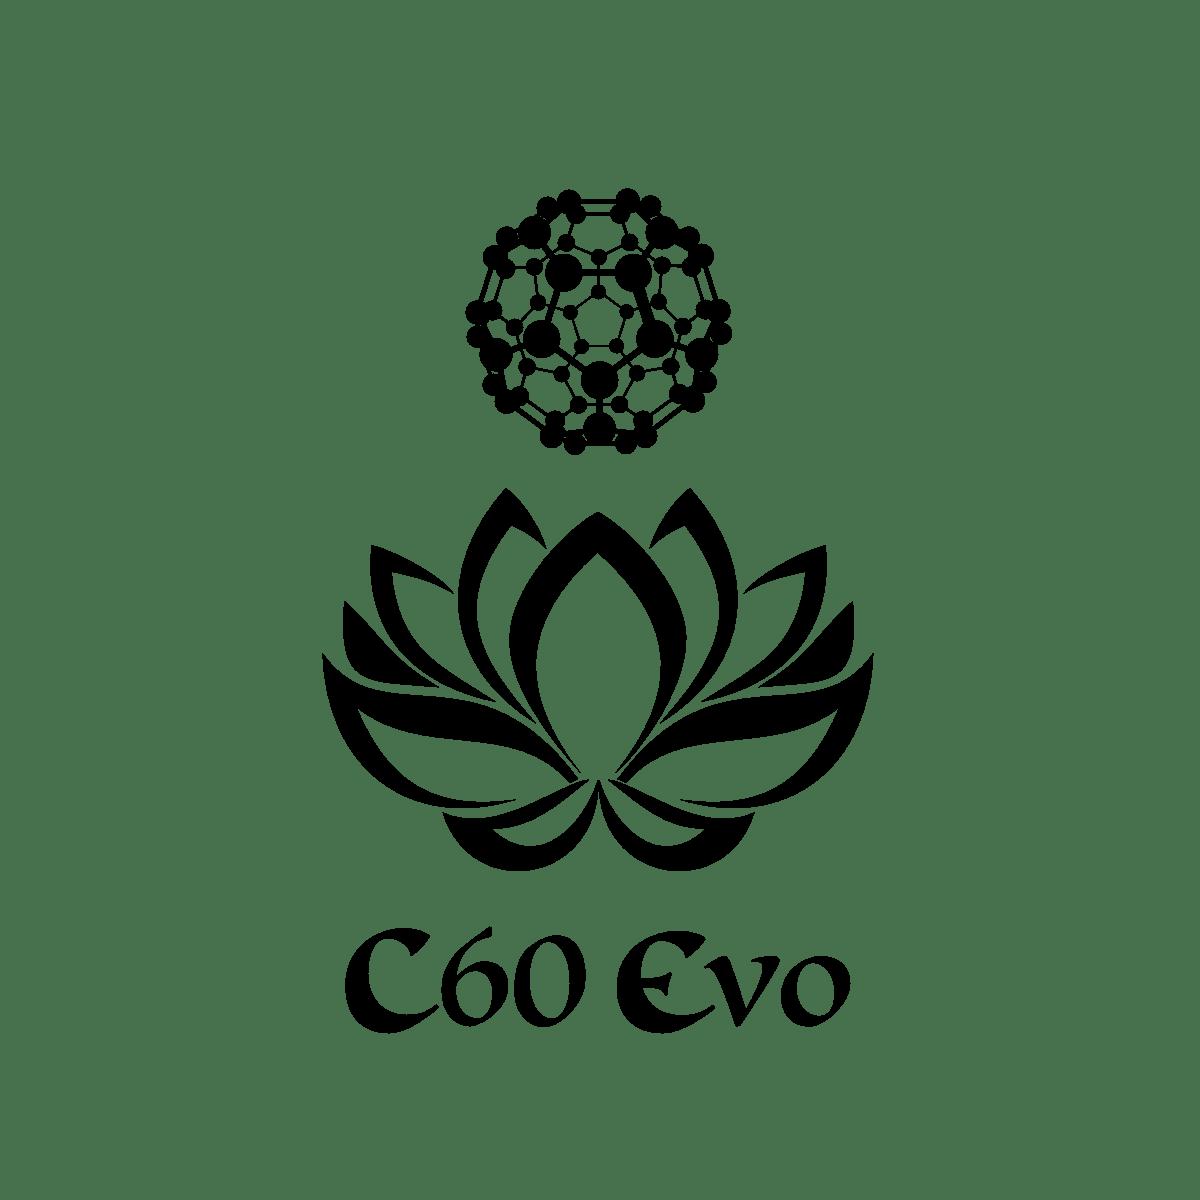 c60 evo logo